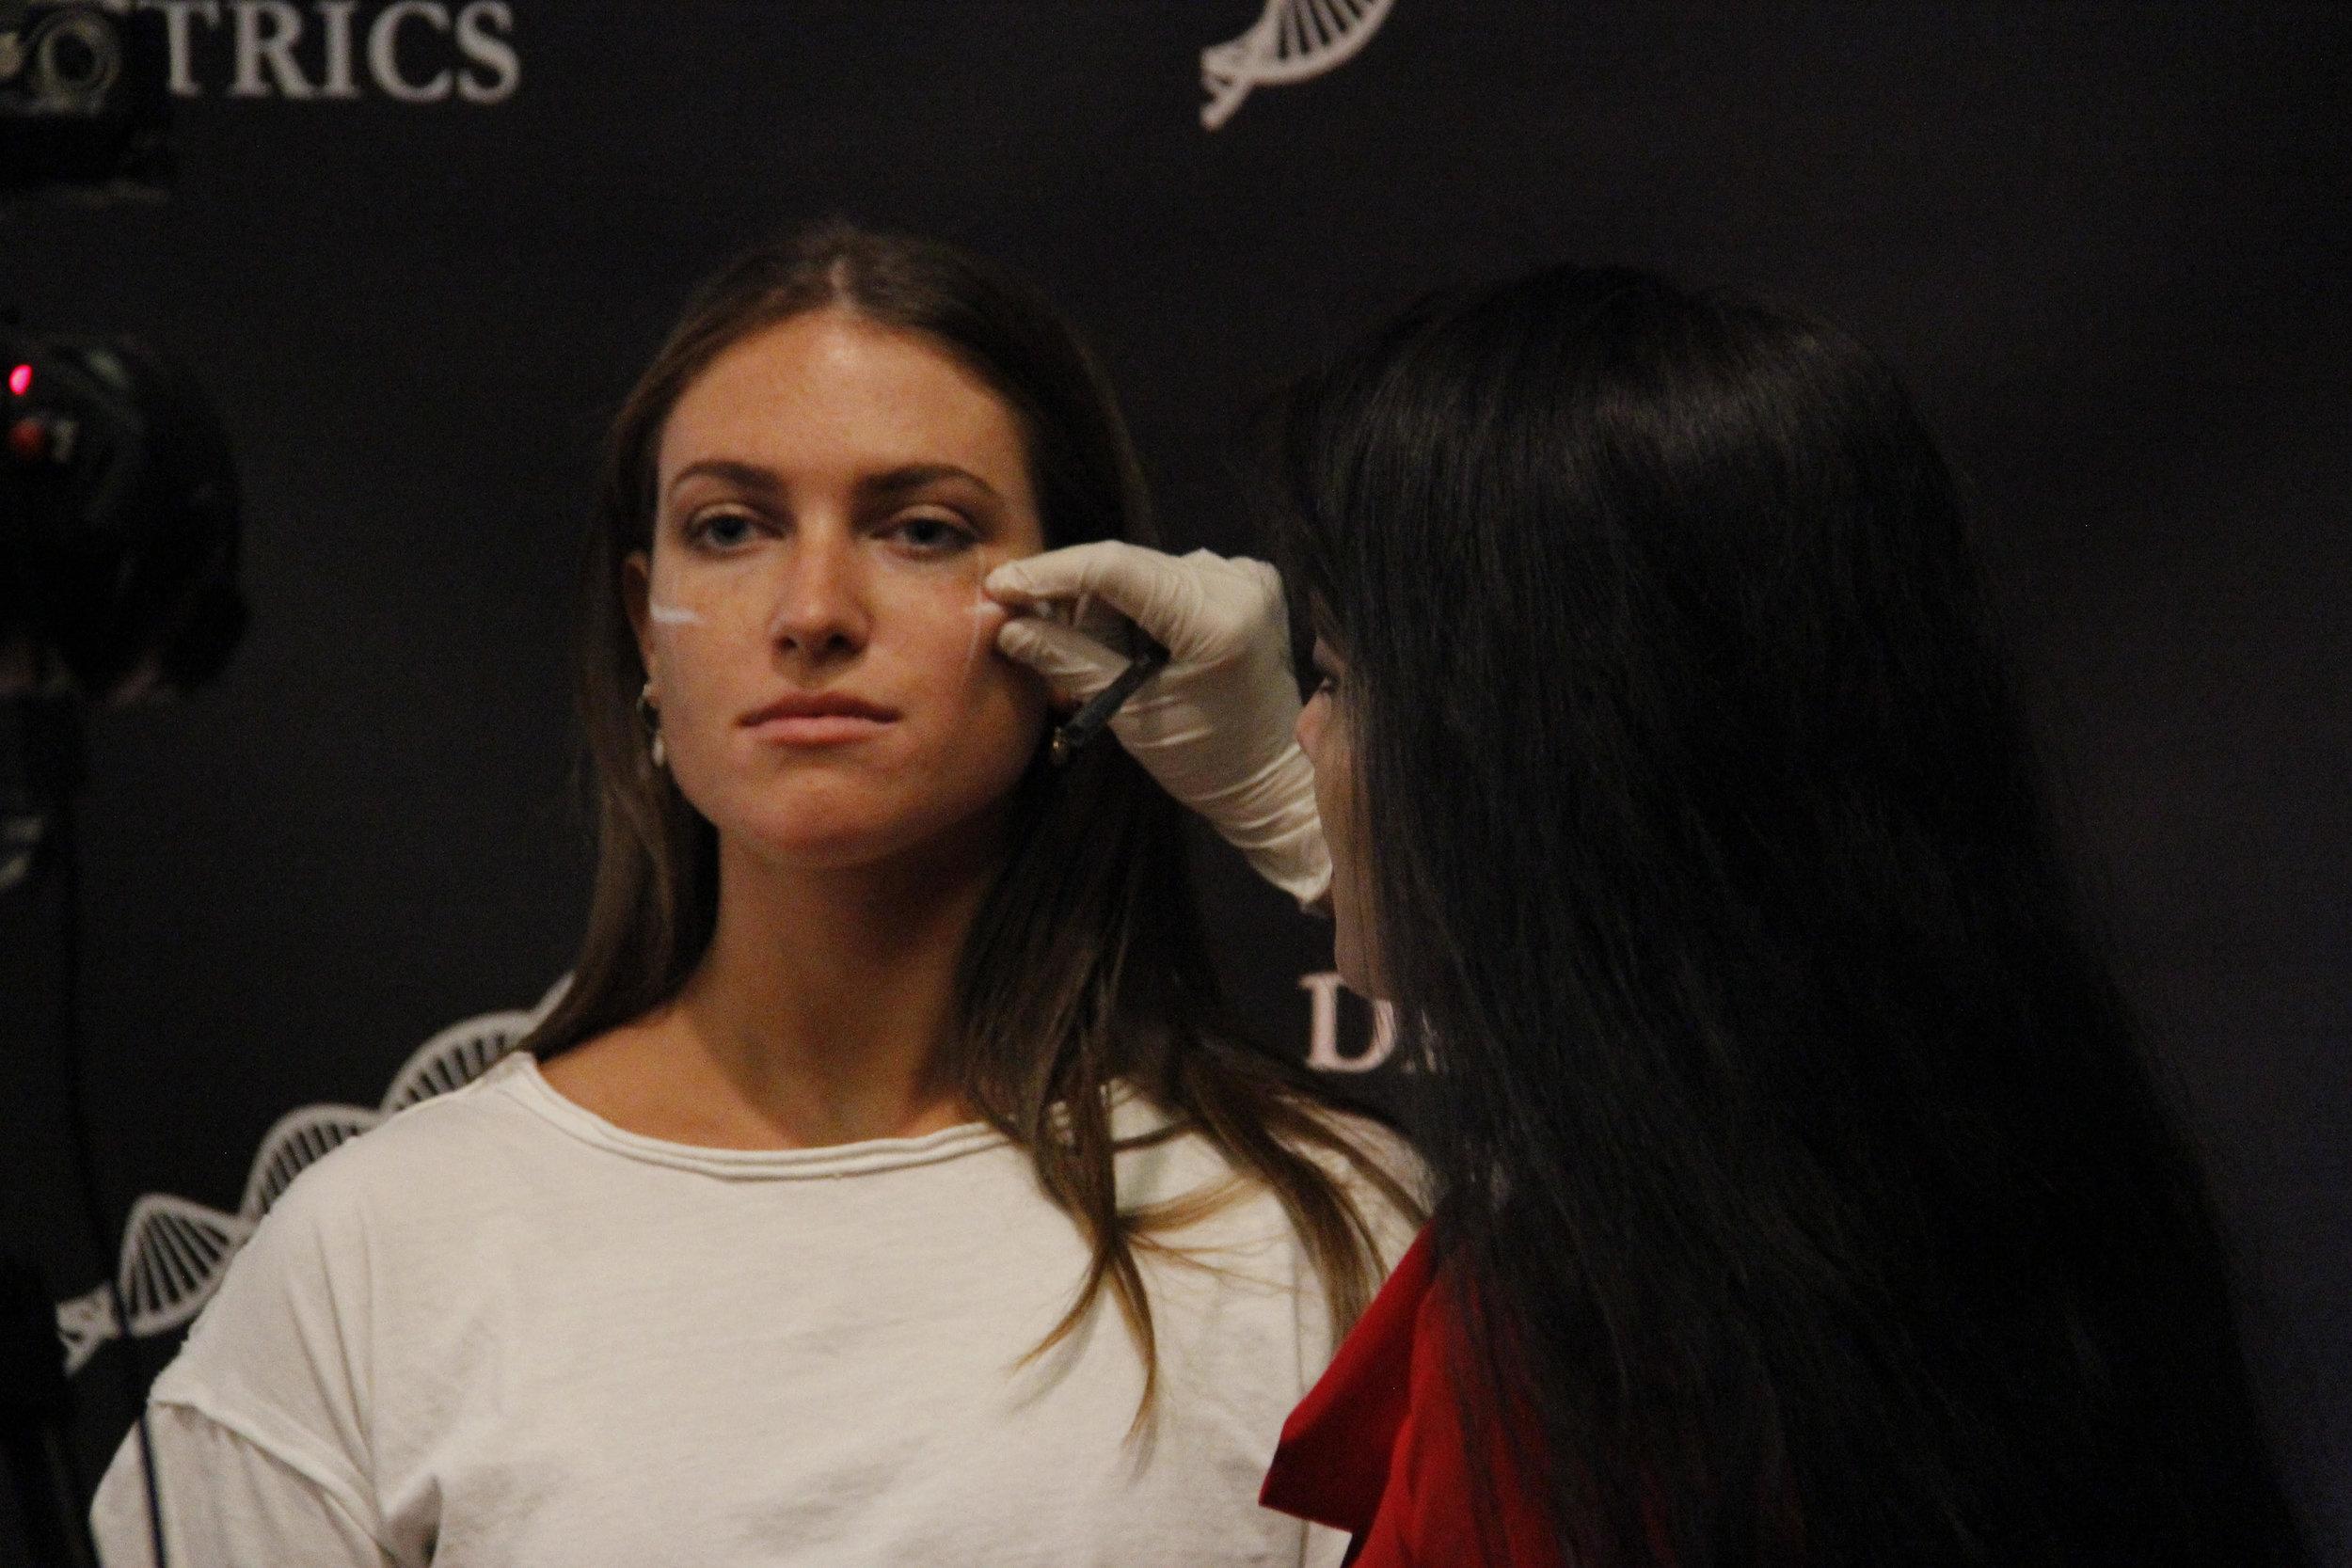 Dr. Devgan marks her patient receiving a jawline augmentation.